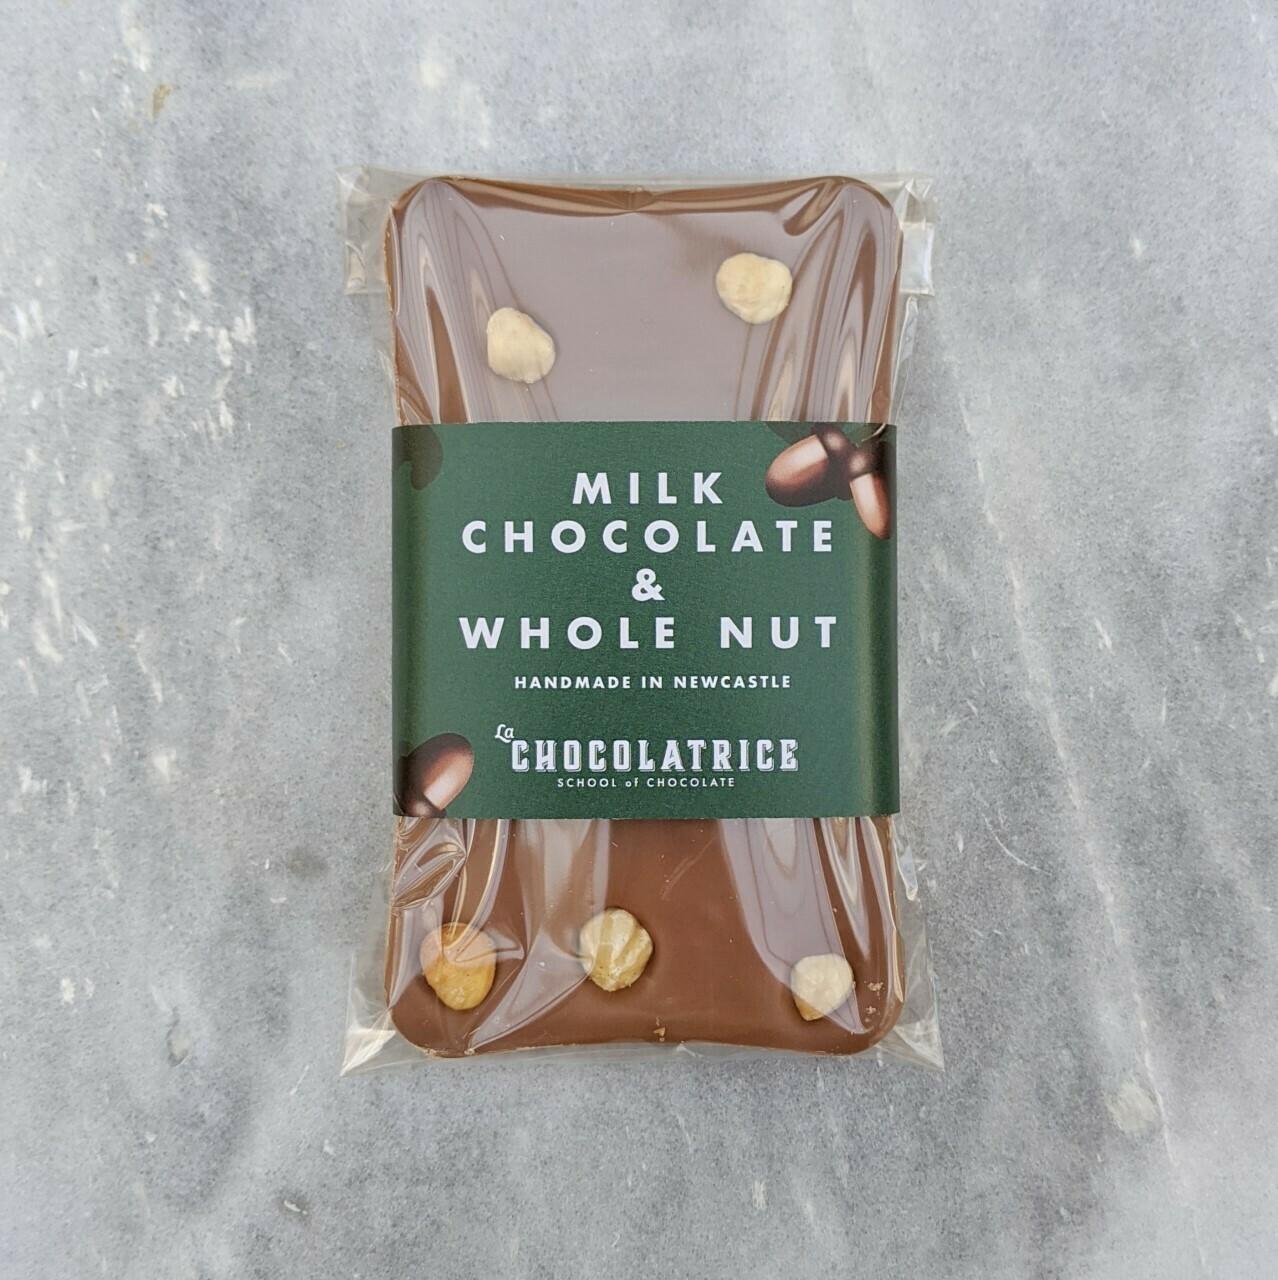 Milk Chocolate Whole Nut